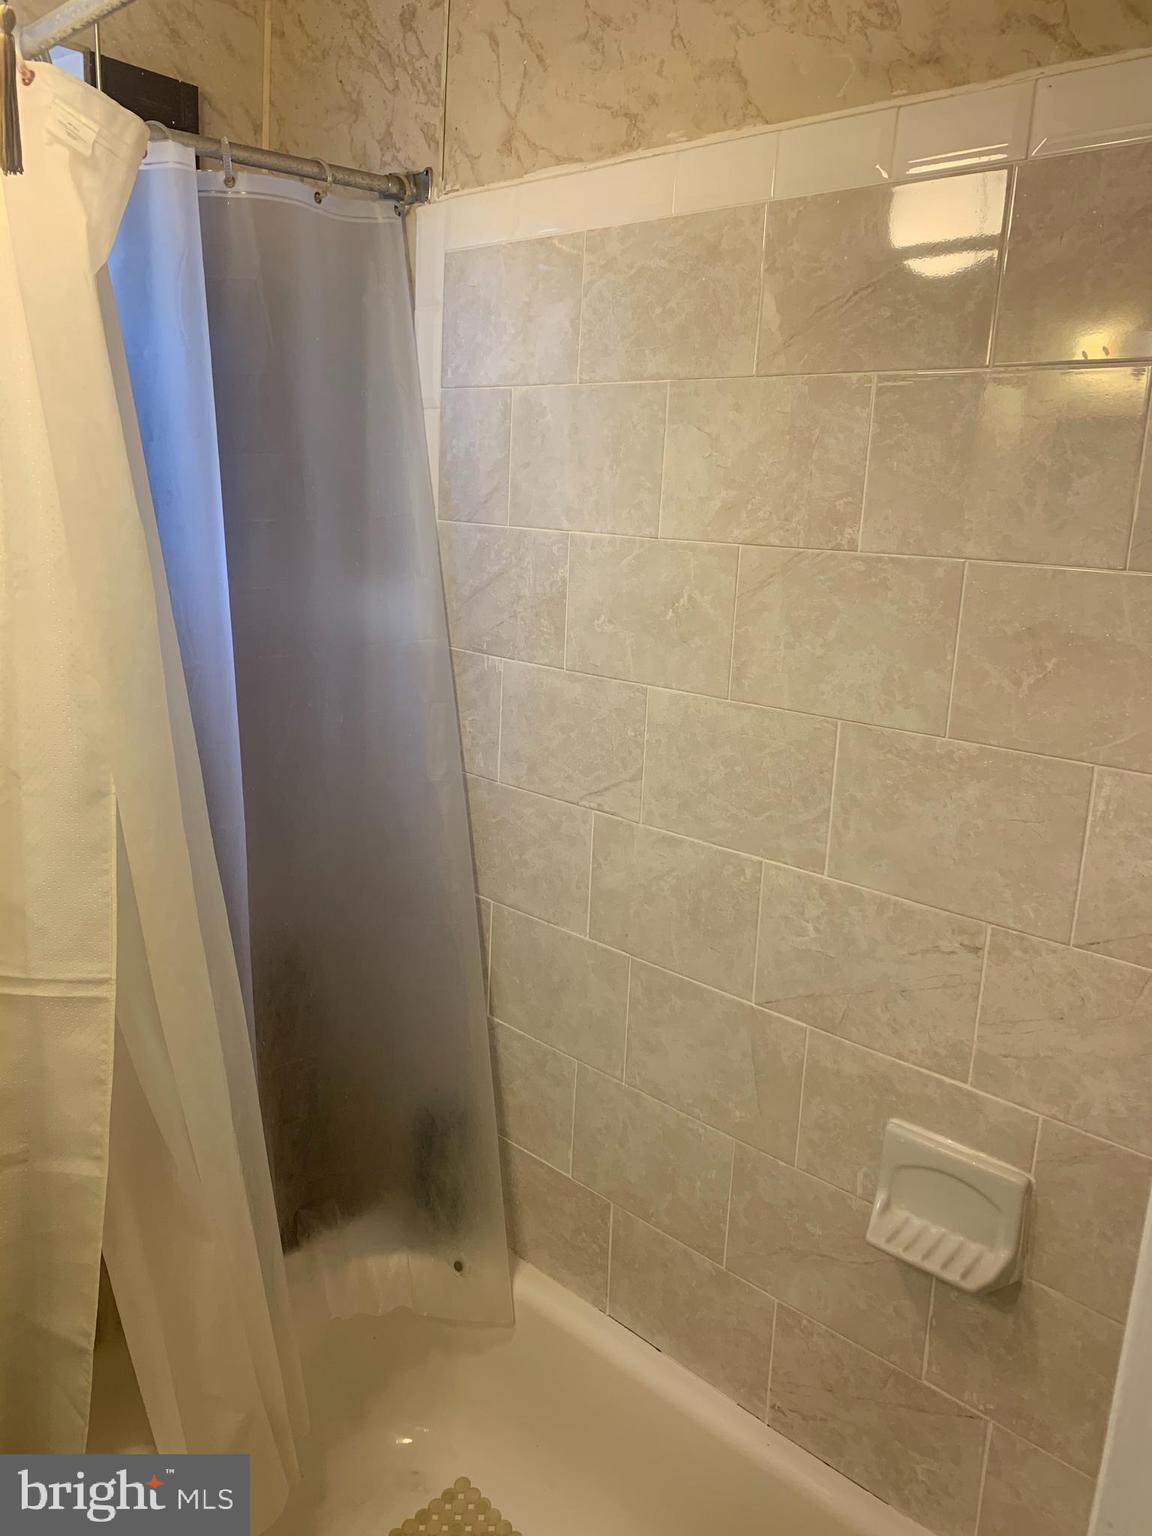 2649 S 12TH STREET S, PHILADELPHIA, Pennsylvania 19148, 3 Bedrooms Bedrooms, ,2 BathroomsBathrooms,Townhouse,For Sale,2649 S 12TH STREET S,PAPH968630